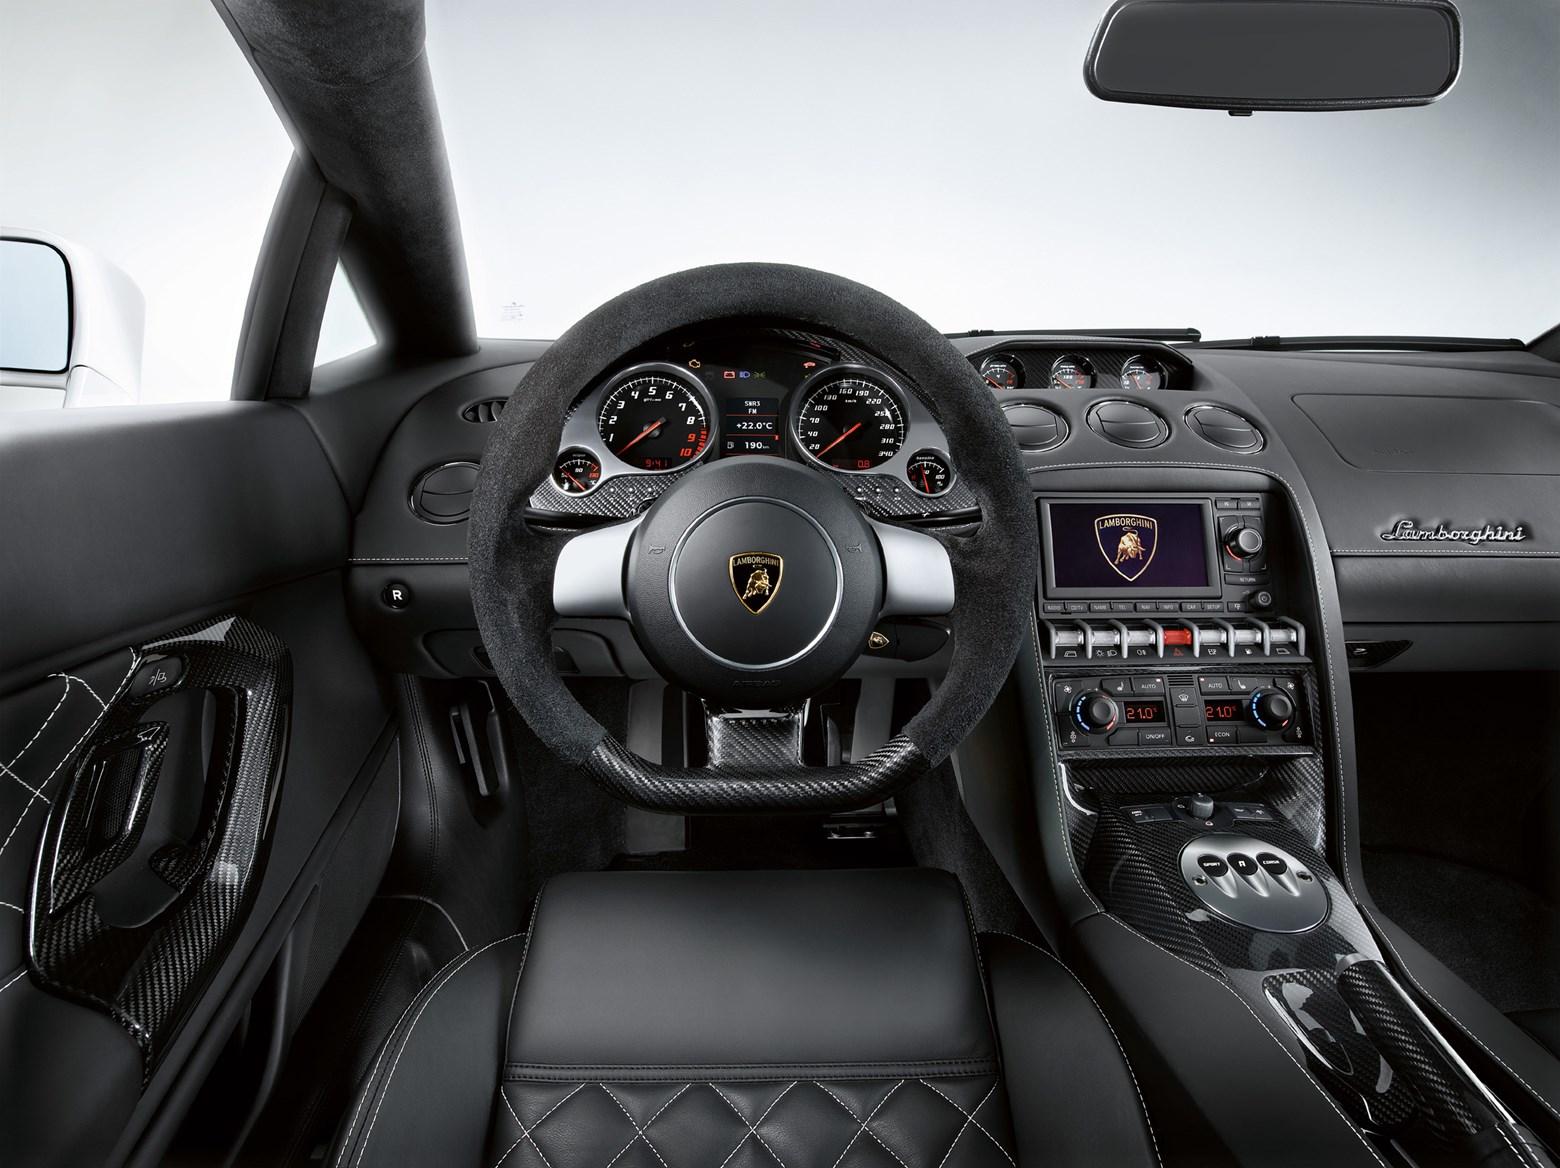 2003 Lamborghini Murcielago Black